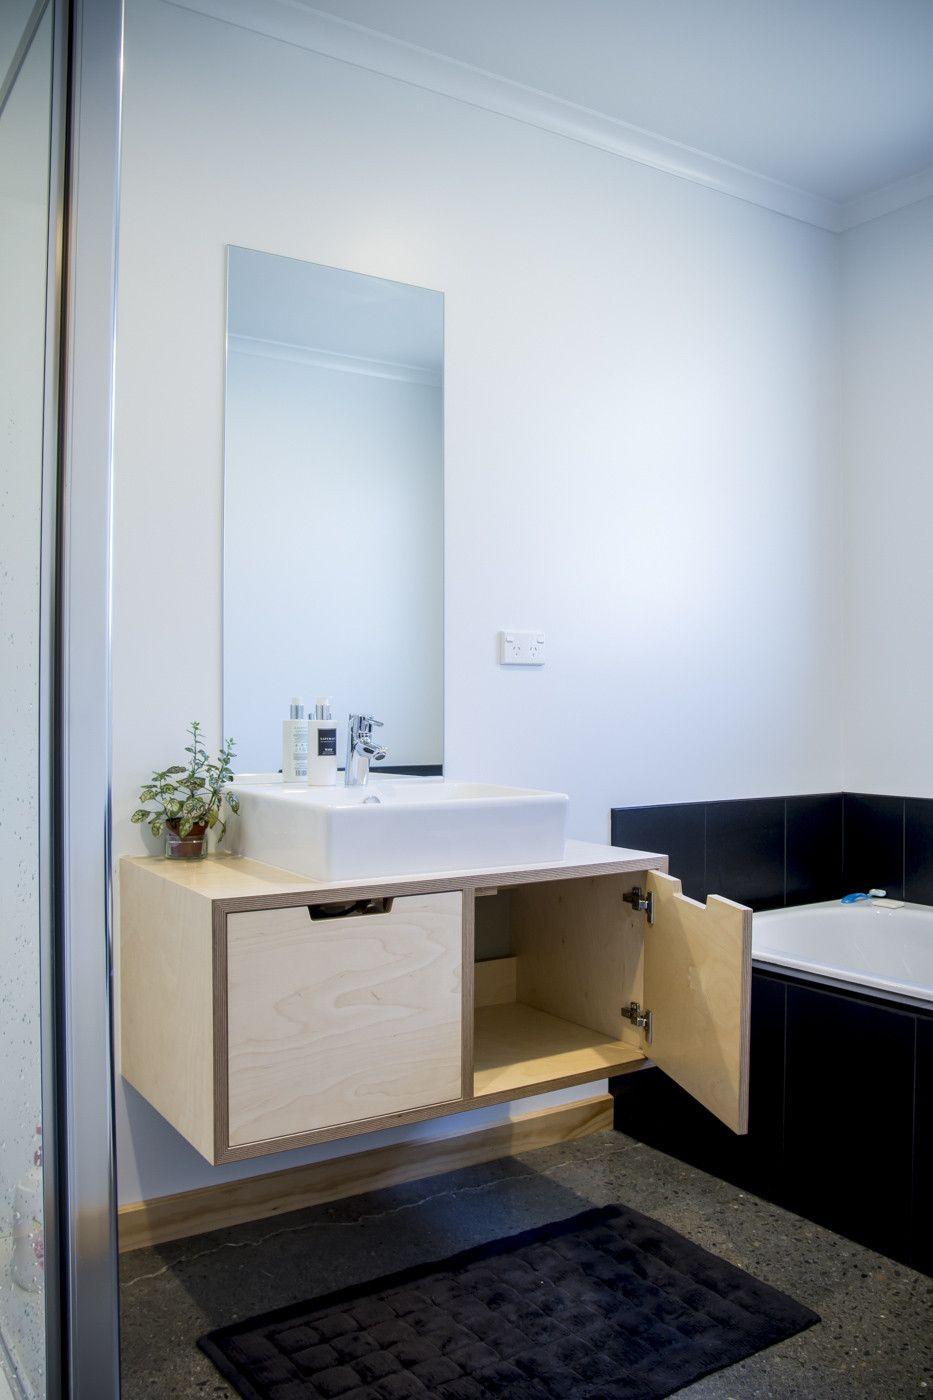 2 Door Birch Plywood Vanity Wall Hung Bathroom Cabinet Rustic Bathroom Vanities Diy Bathroom Decor